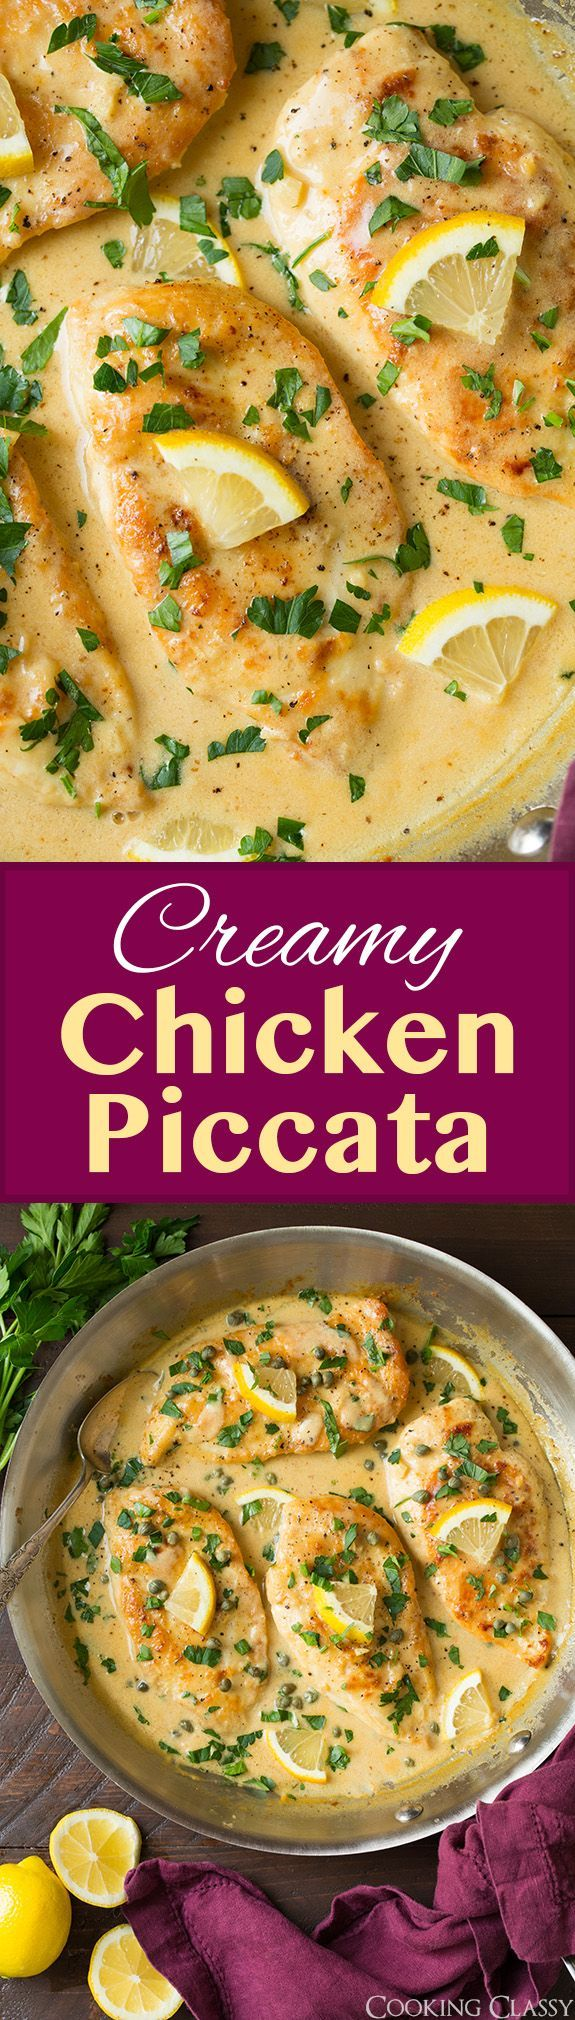 Creamy Chicken Piccata - this is my FAVORITE chicken piccata recipe! Unbelievably delicious! Love the addition of cream.